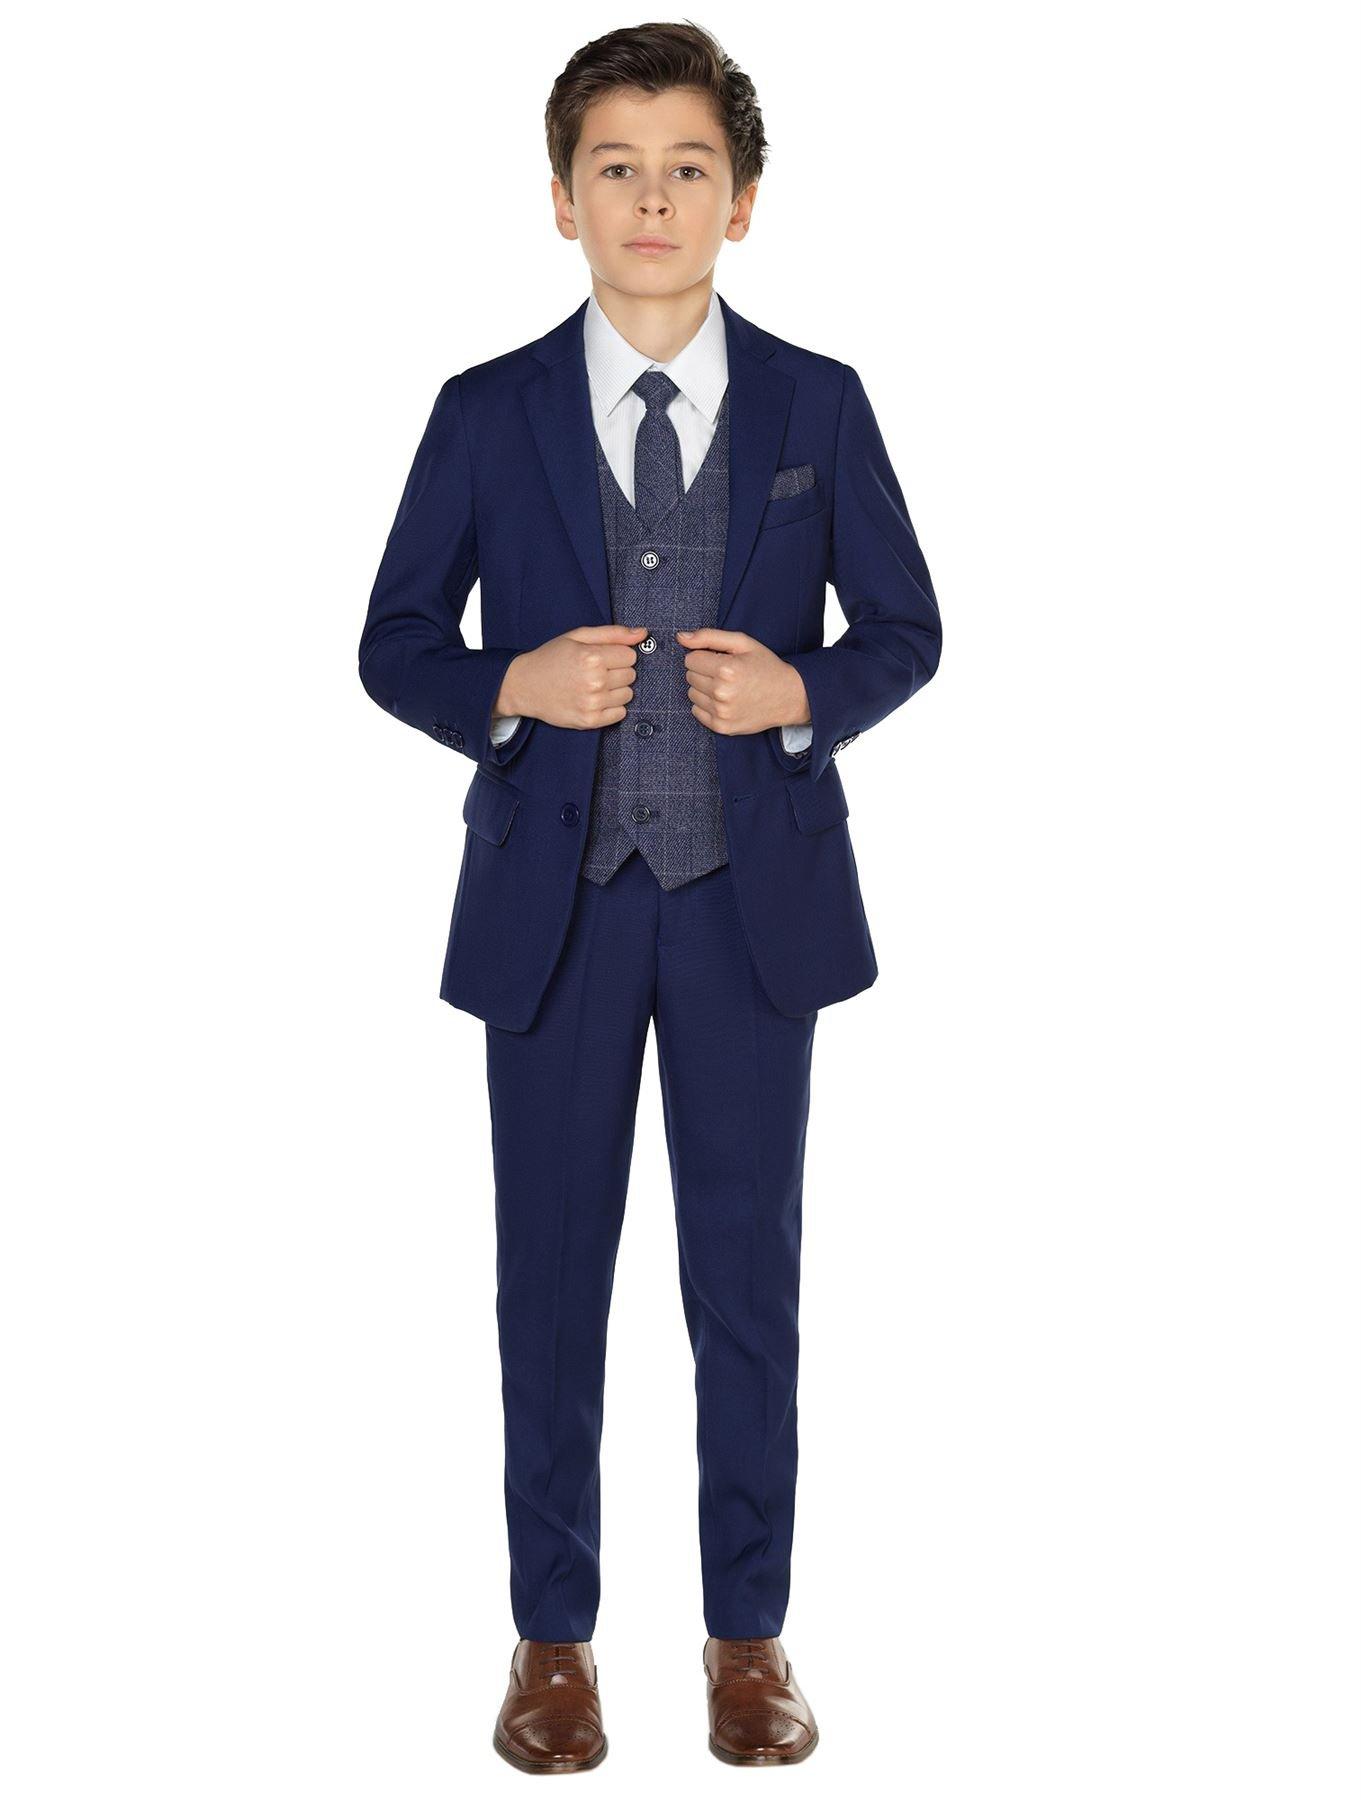 Paisley of London, Kingsman Blue, Boys Ring Bearer Suit Shirt Benedict Navy Vest, 12